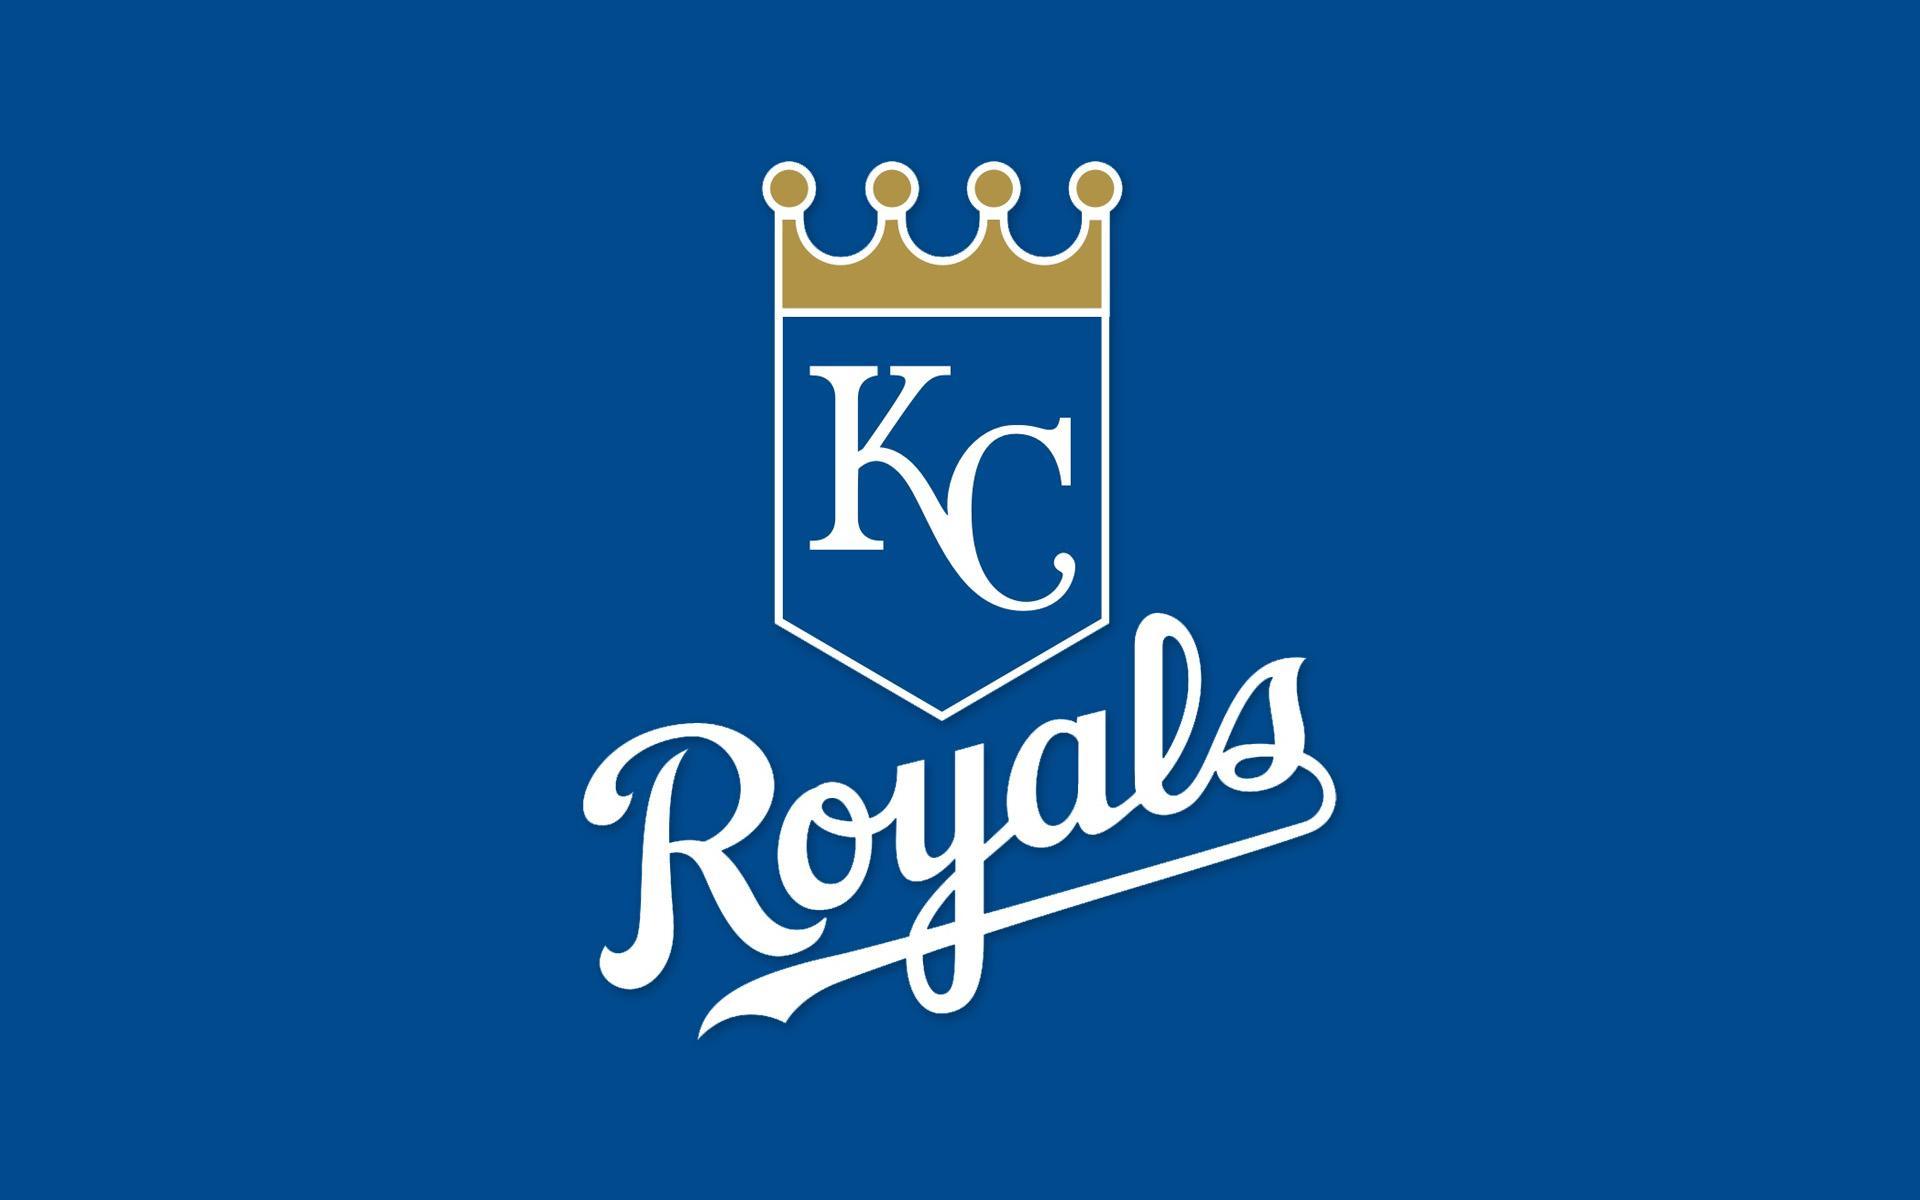 Kansas City Royals Wallpapers 1920x1200